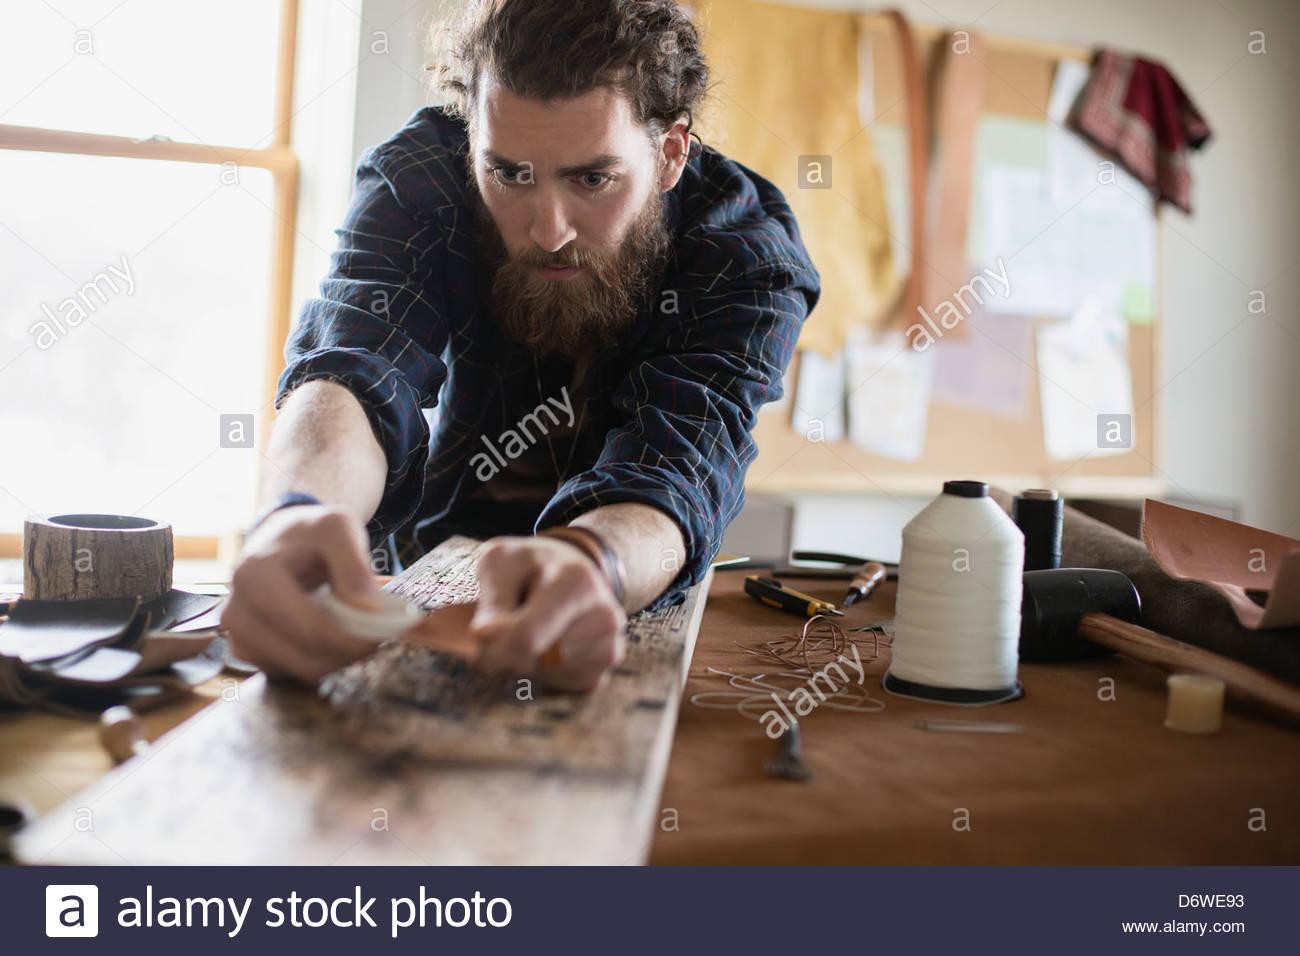 Young man finishing leather belt at workshop - Stock Image